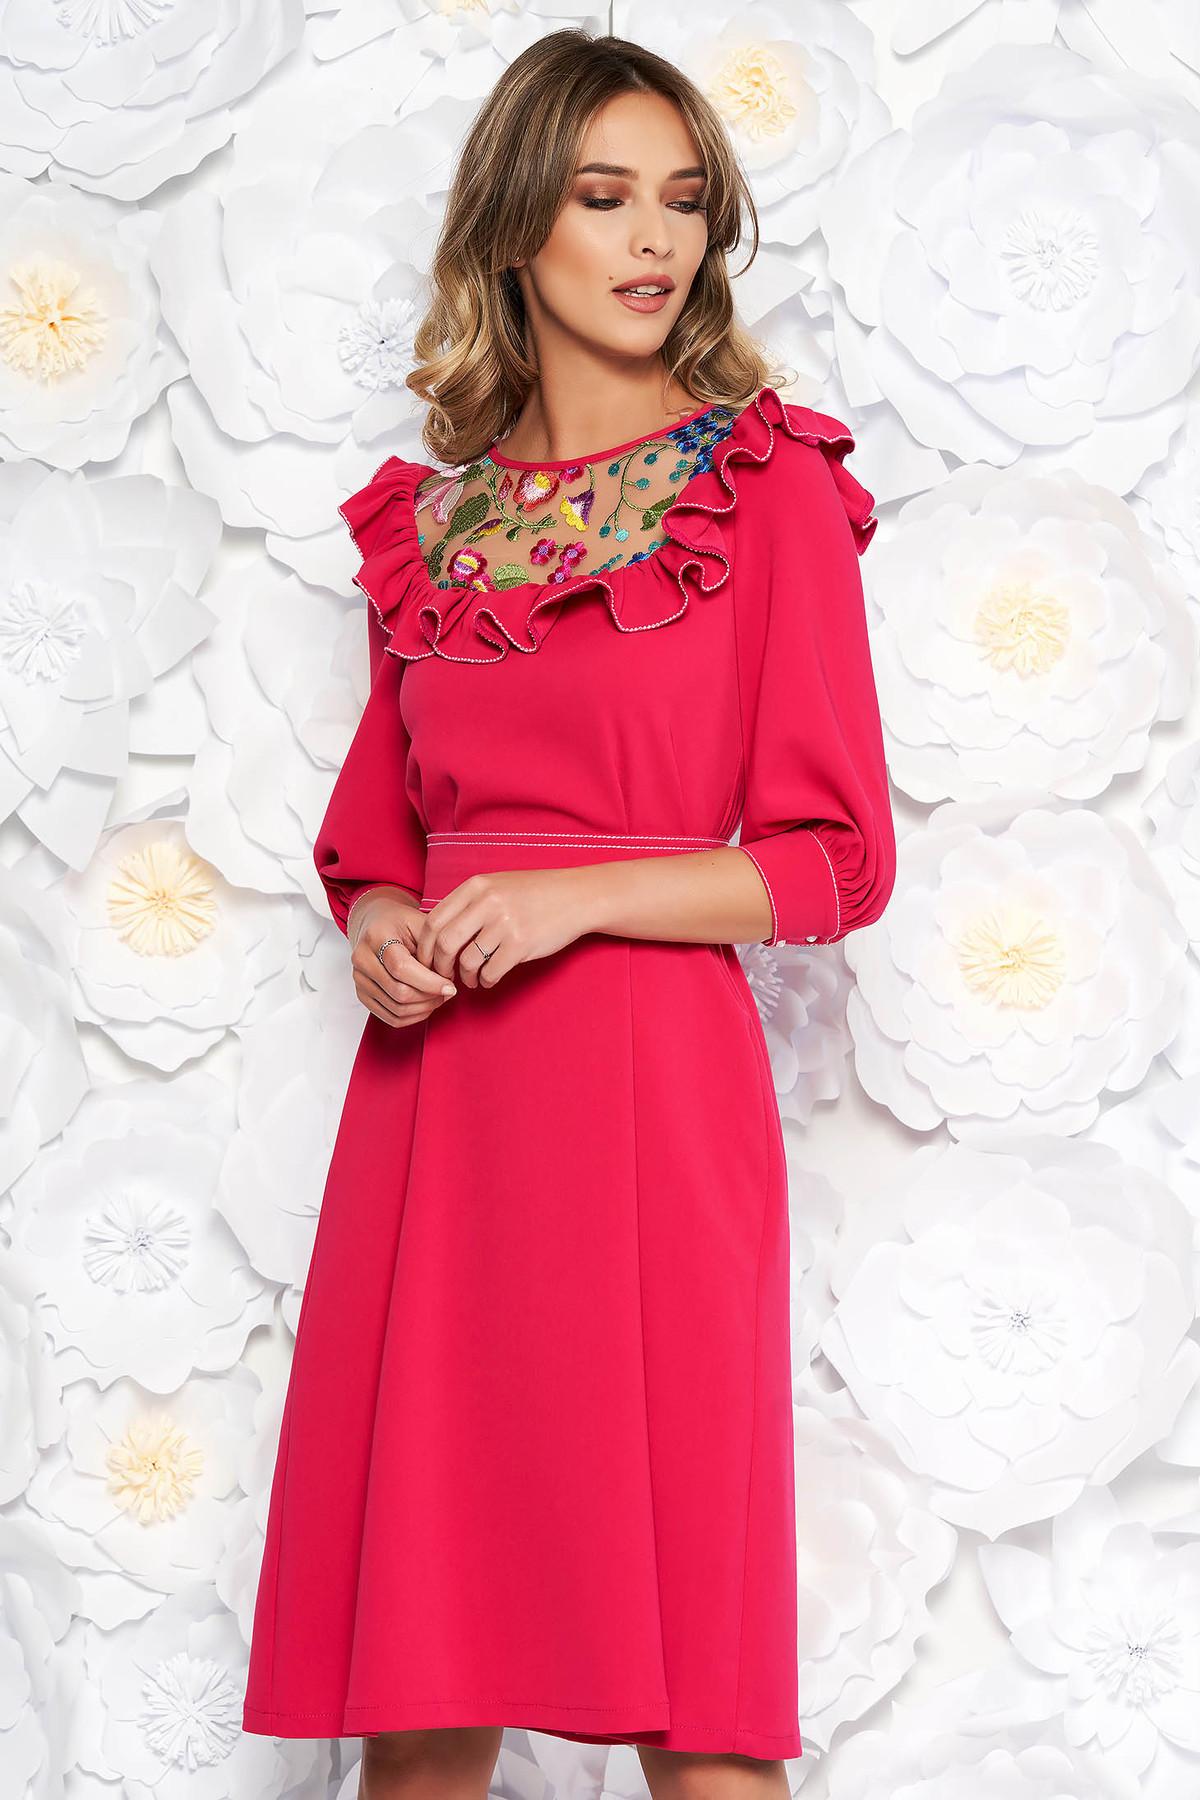 Rochie LaDonna fuchsia eleganta brodata cu croi larg din stofa subtire usor elastica captusita pe interior accesorizata cu cordon